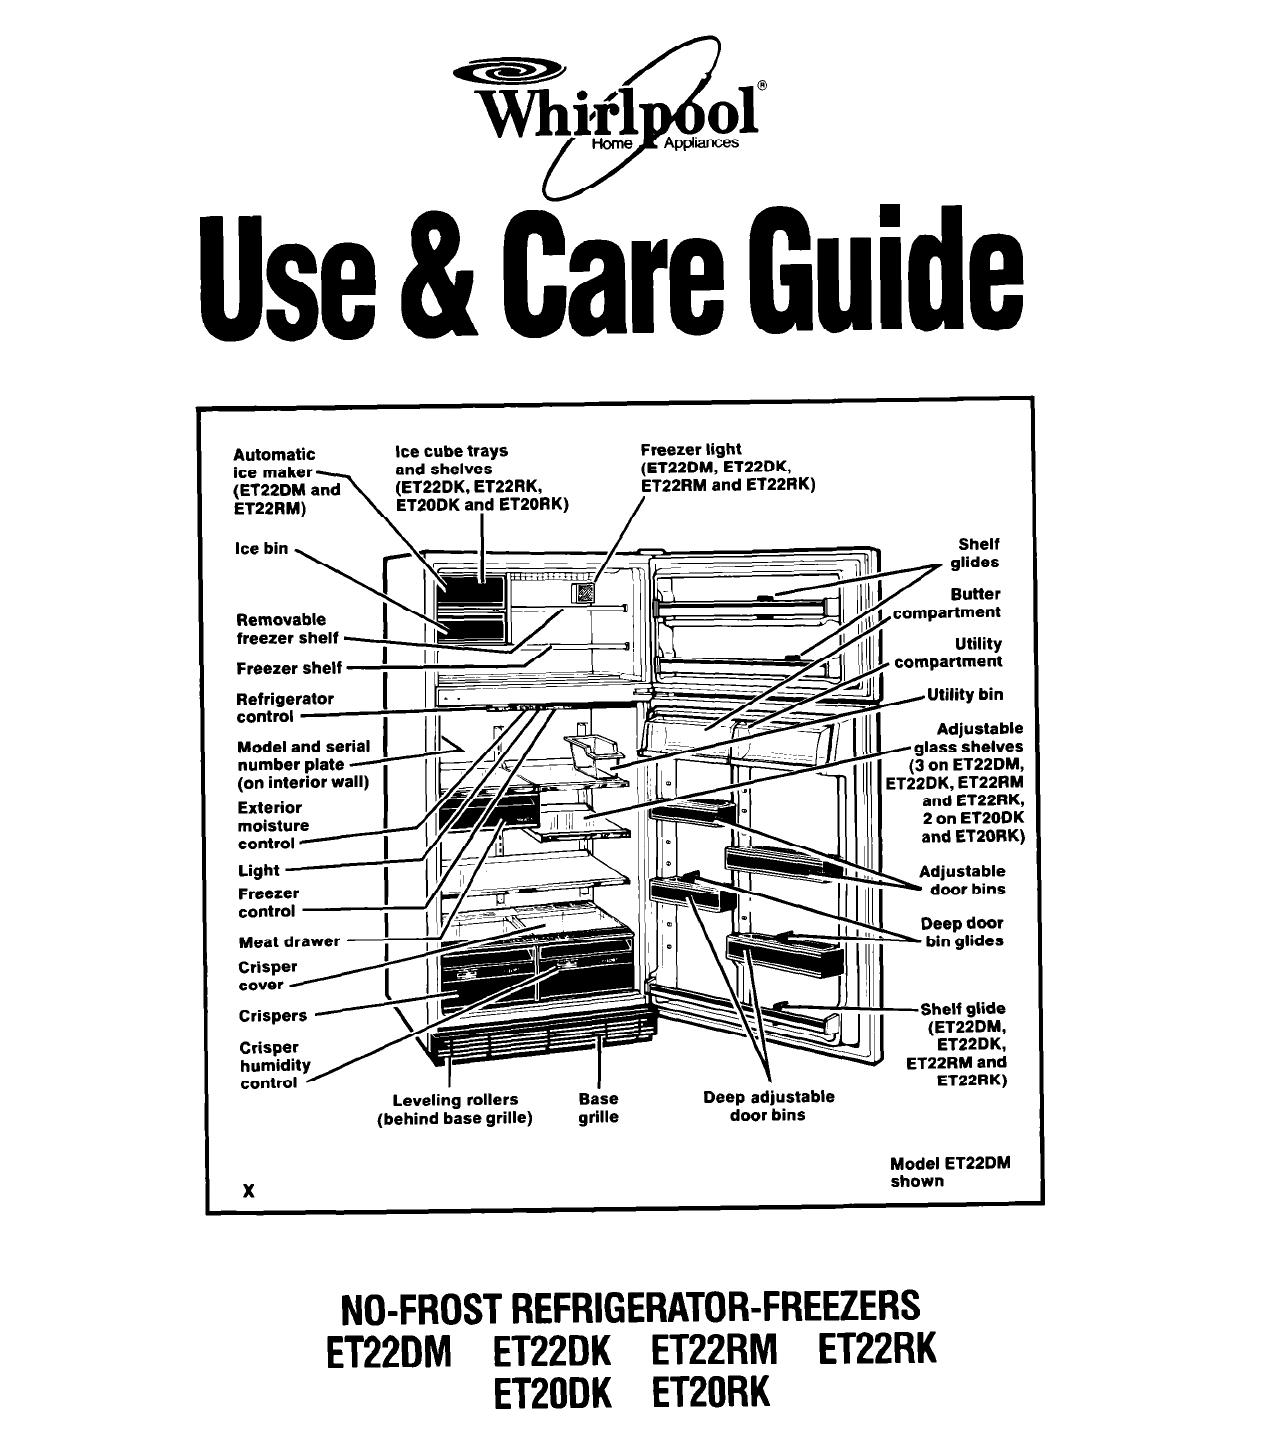 hight resolution of whirlpool refrigerator schematic wiring diagram technic whirlpool refrigerator wiring harness whirlpool et22dk et20dk et20rk